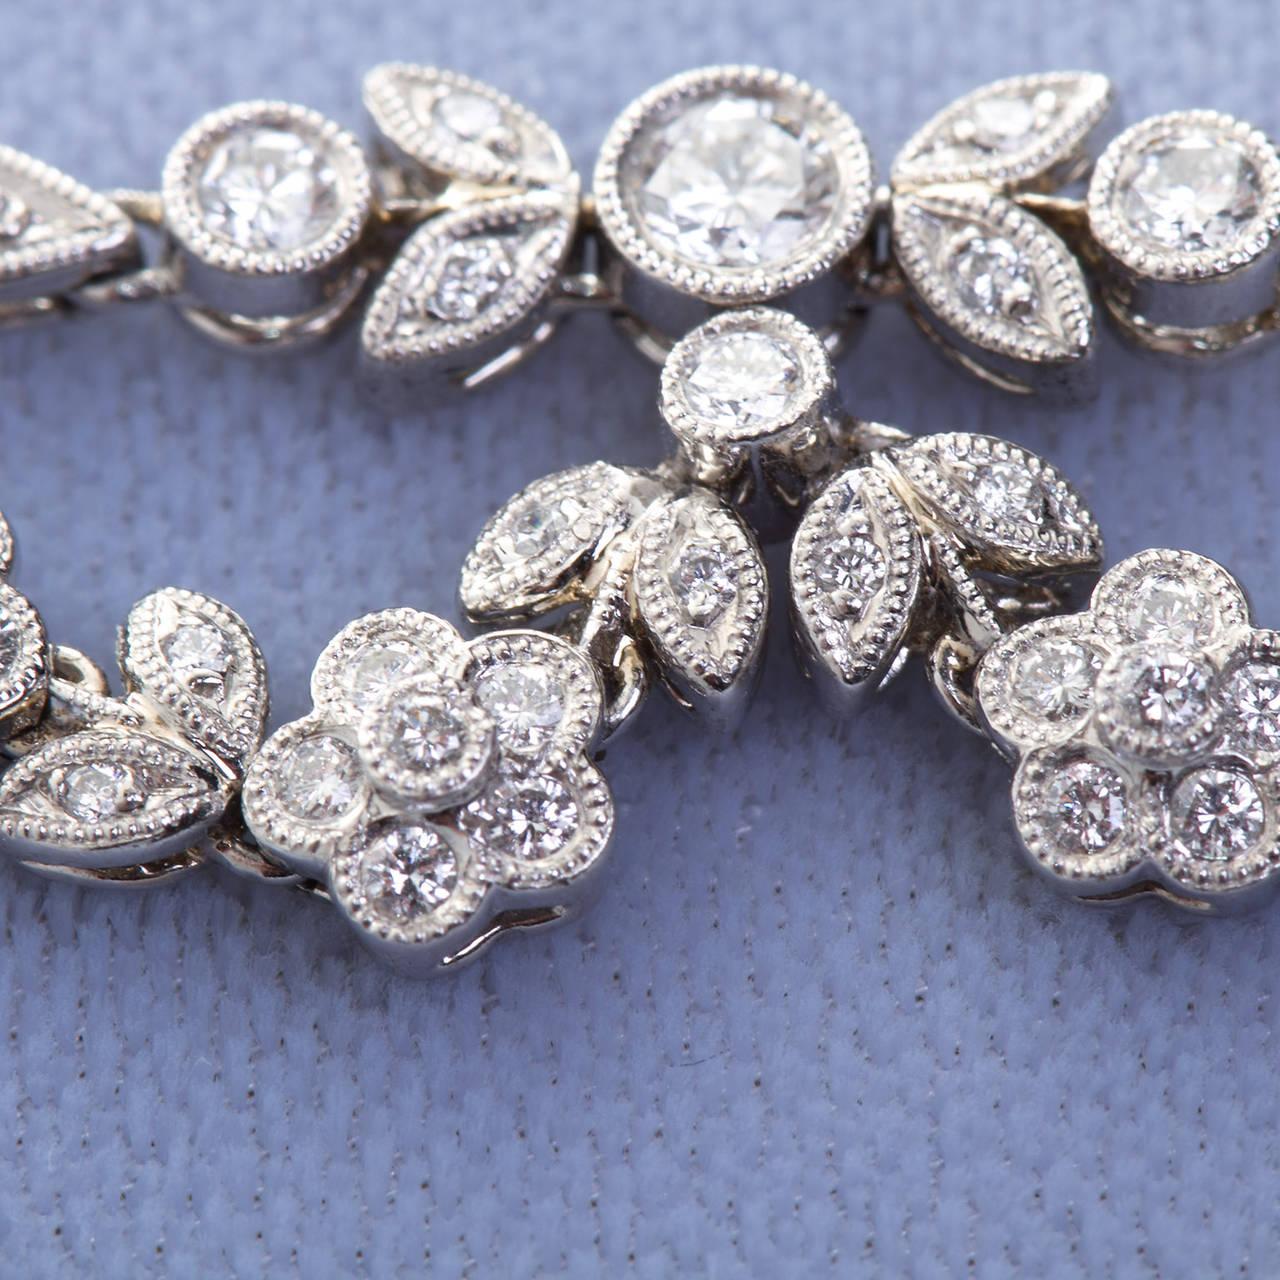 Antique 5.06 Carat Fancy Yellow Pear Shaped Diamond Drape Necklace 5